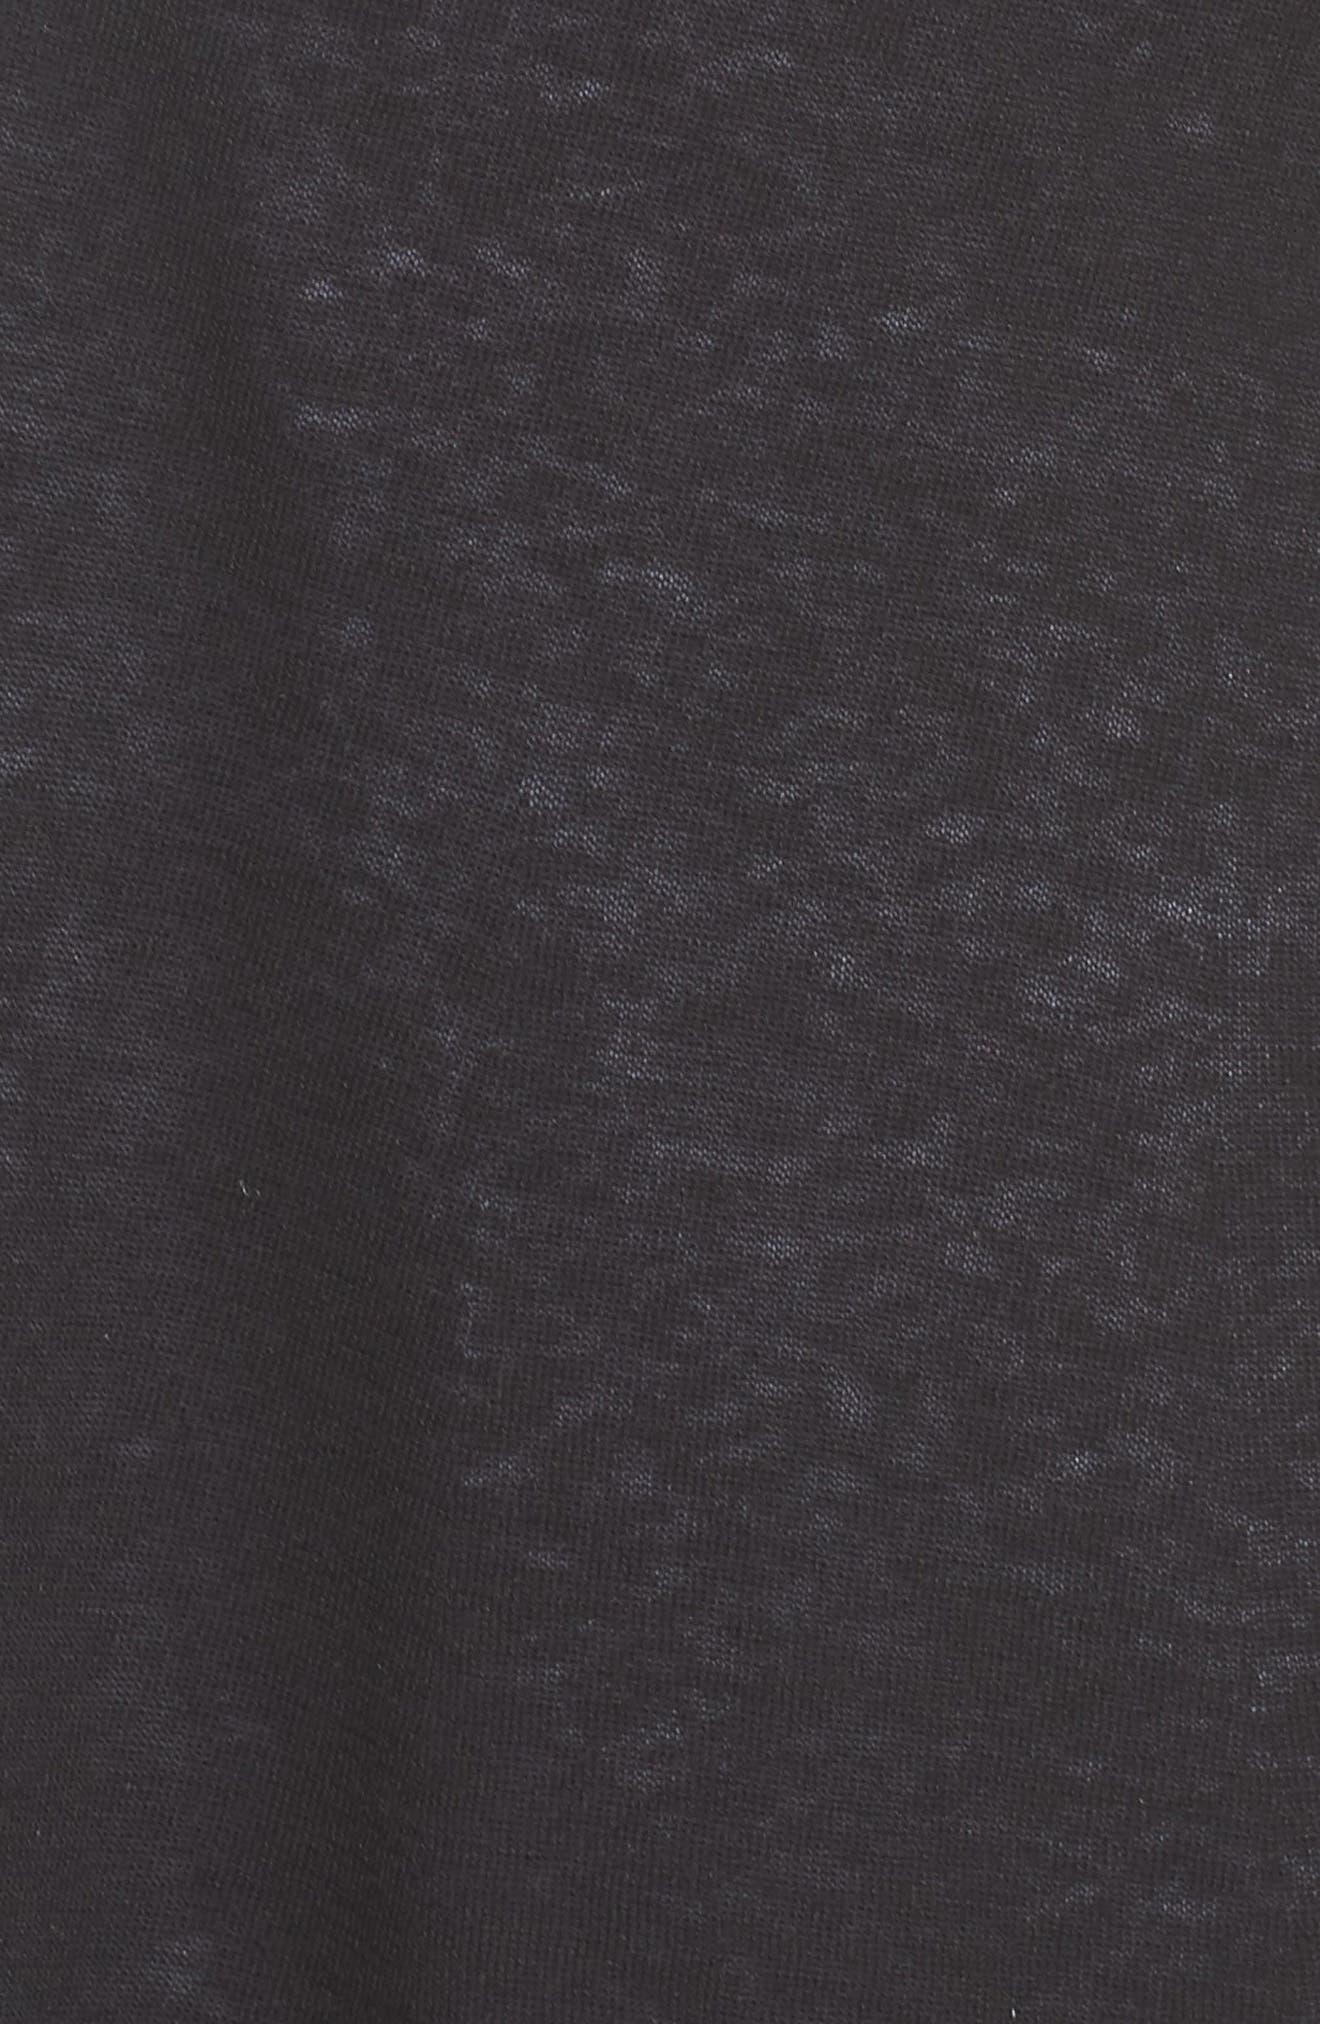 Silk & Organic Linen Long Cardigan,                             Alternate thumbnail 5, color,                             001